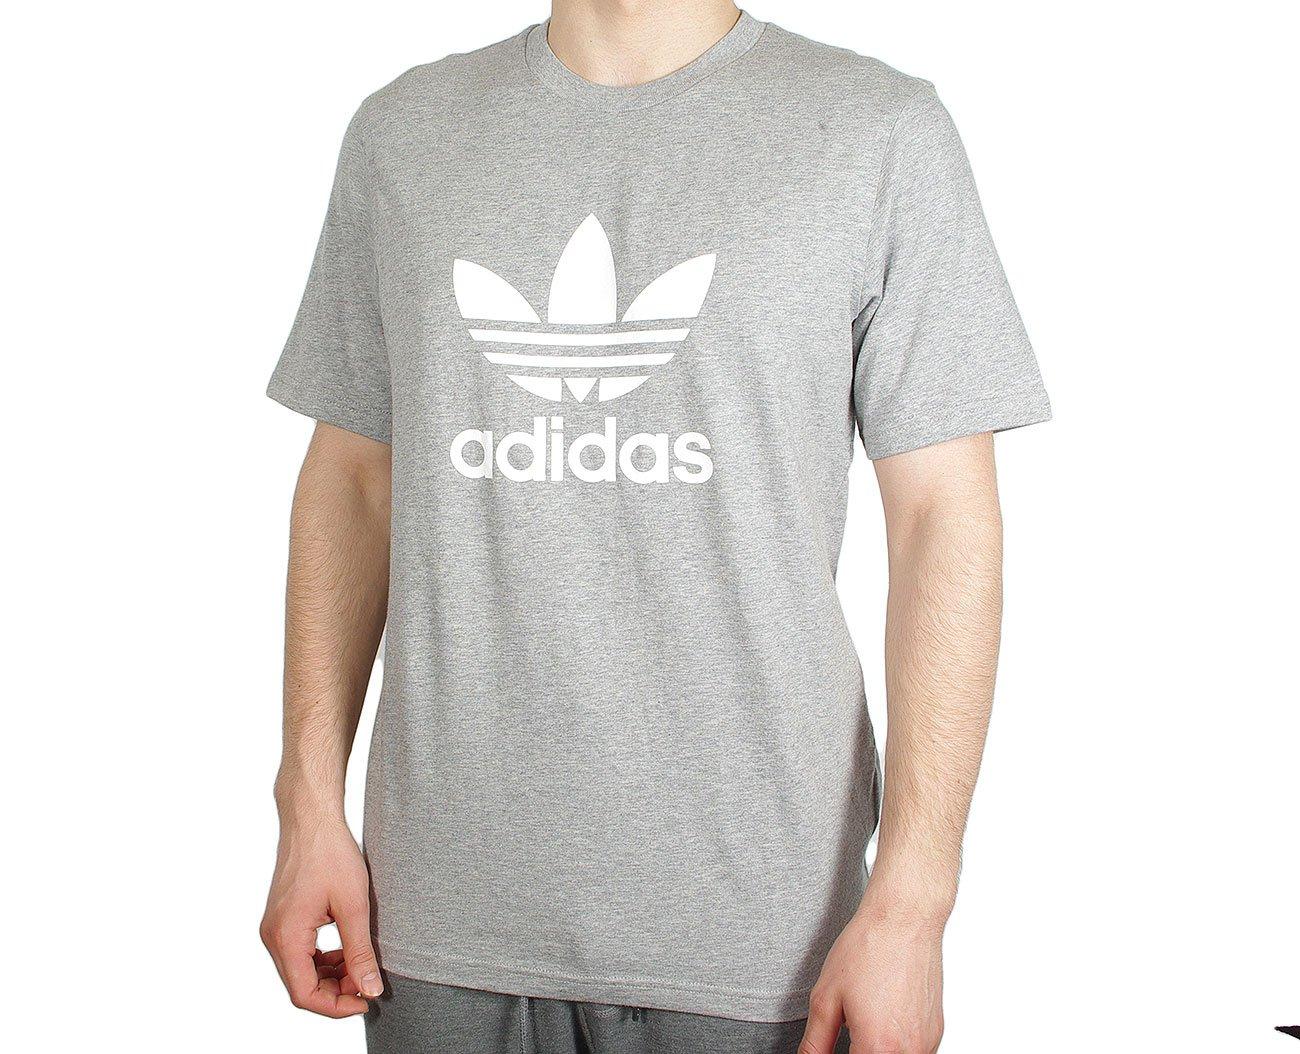 Adidas Trefoil T-Shirt Medium Grey Heather